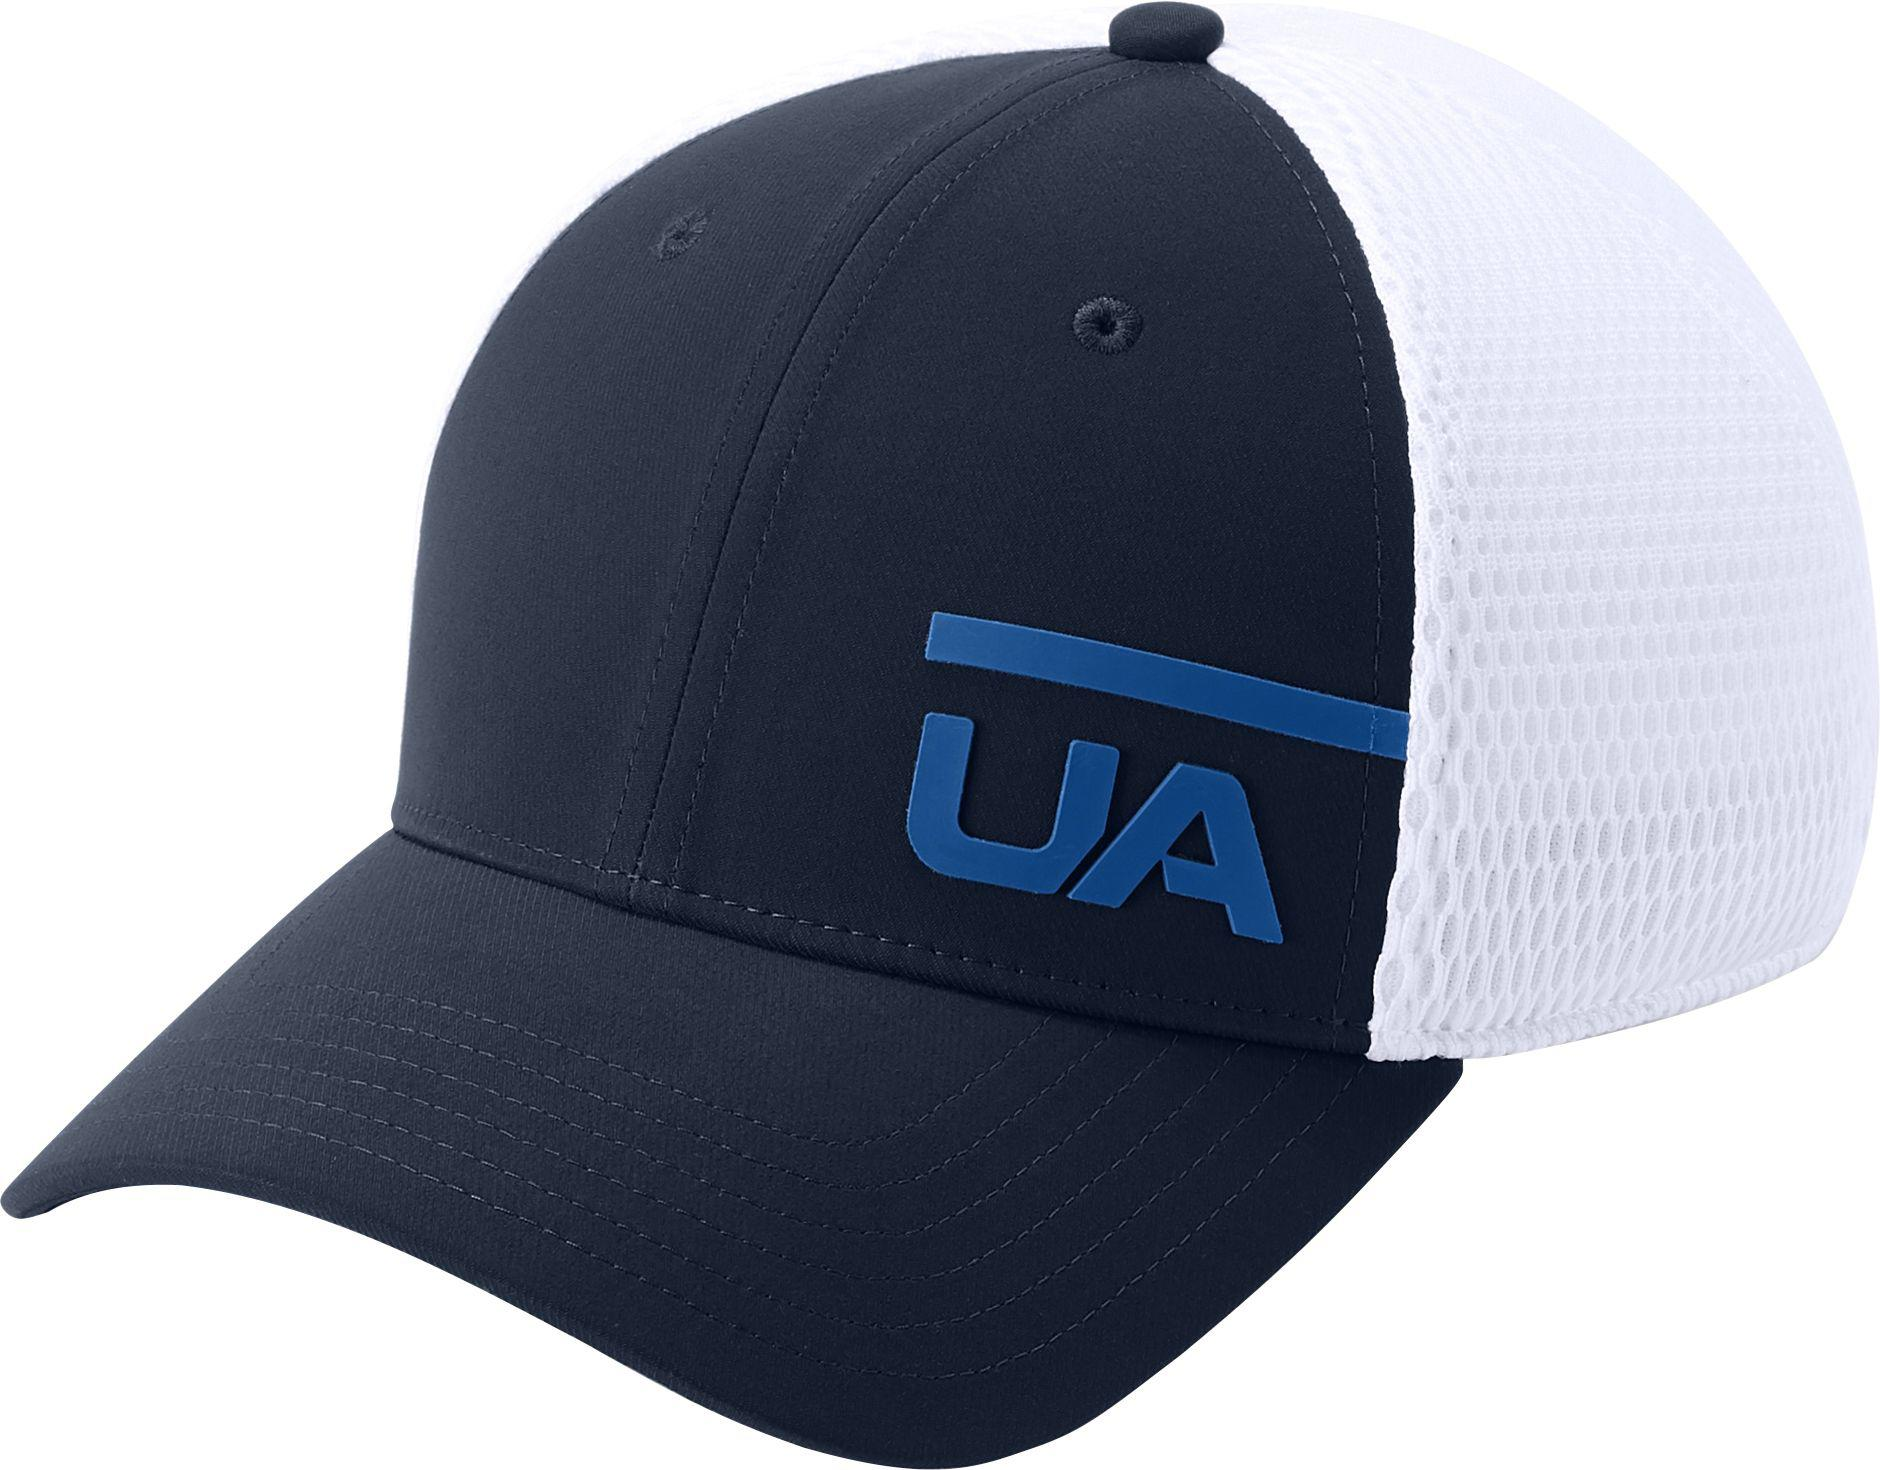 c64f6c89d92 Lyst - Under Armour Spacer Mesh Hat for Men